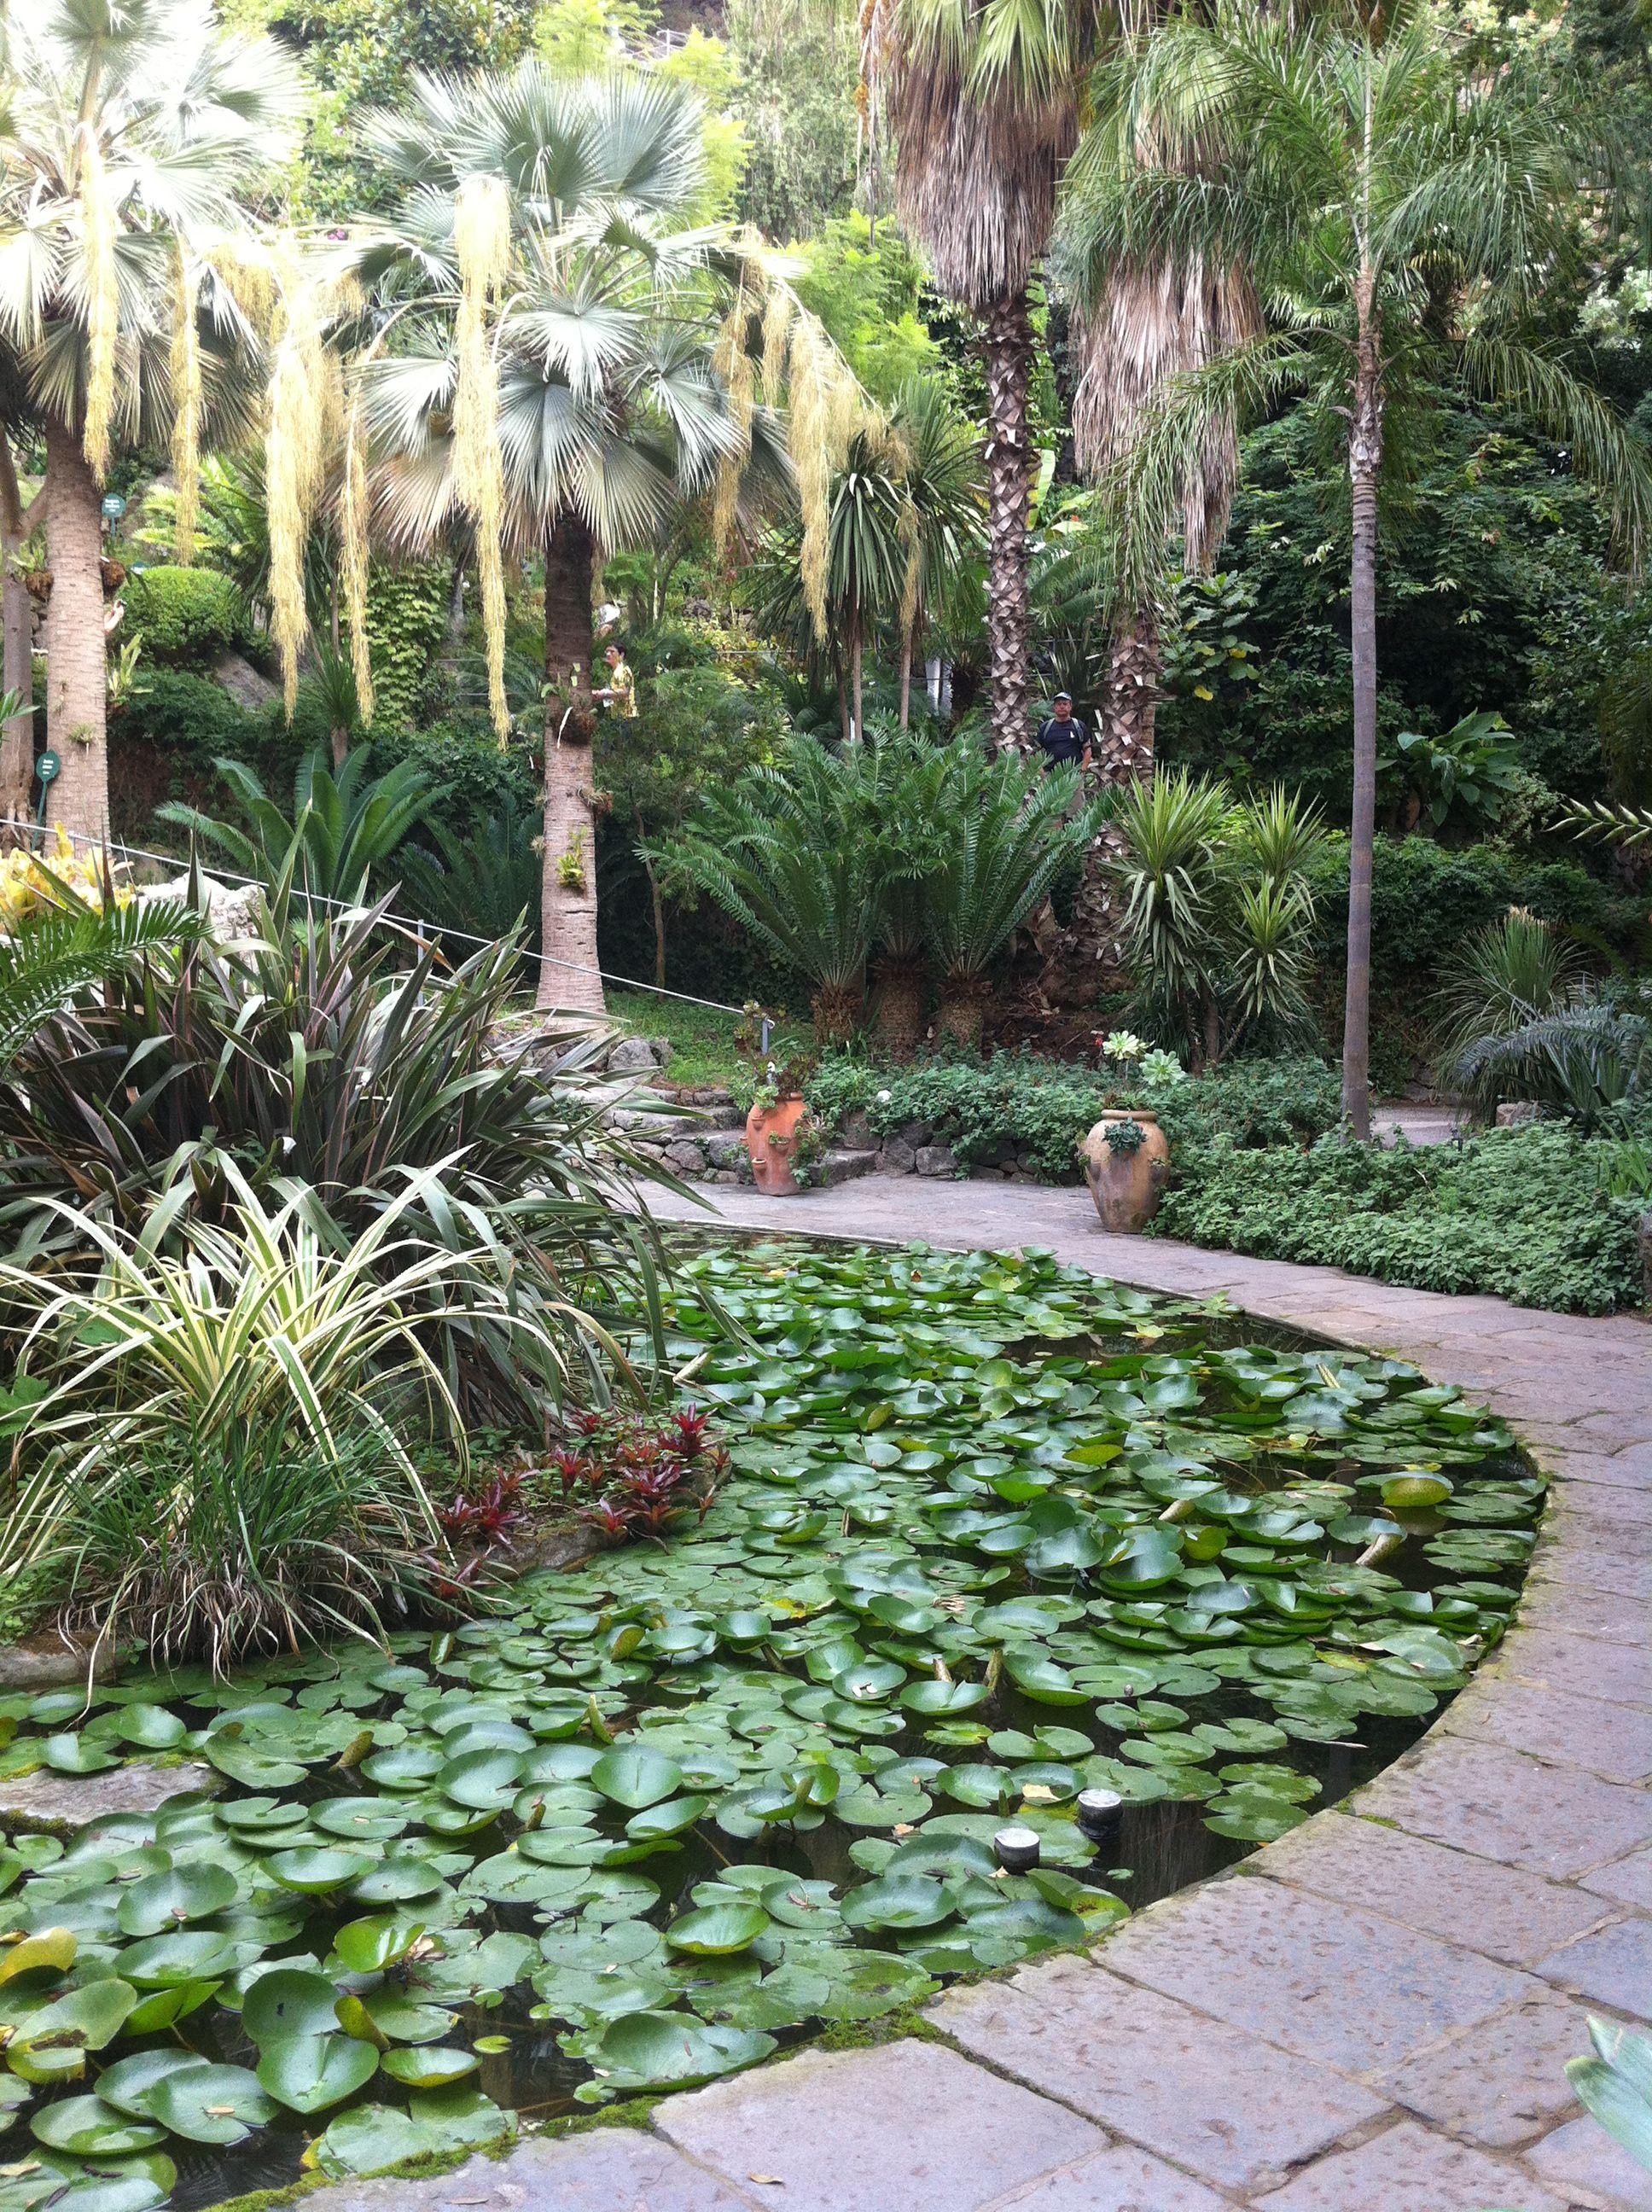 Giardini la mortella ischia italy places garden for Garden giardini